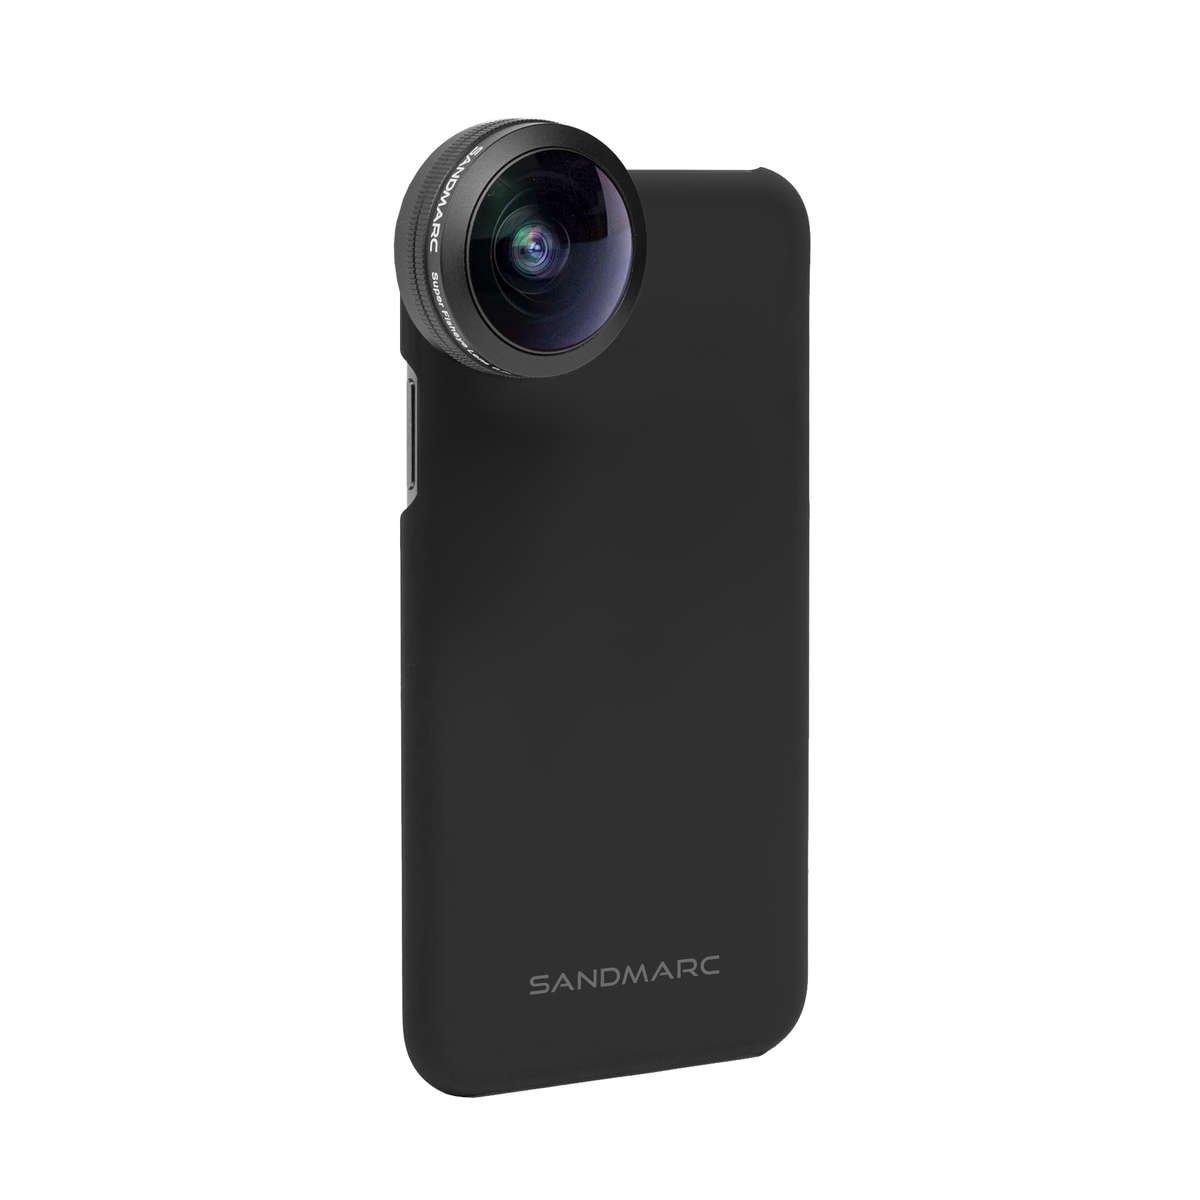 watch 01a6f 45643 iPhone Lenses - SANDMARC